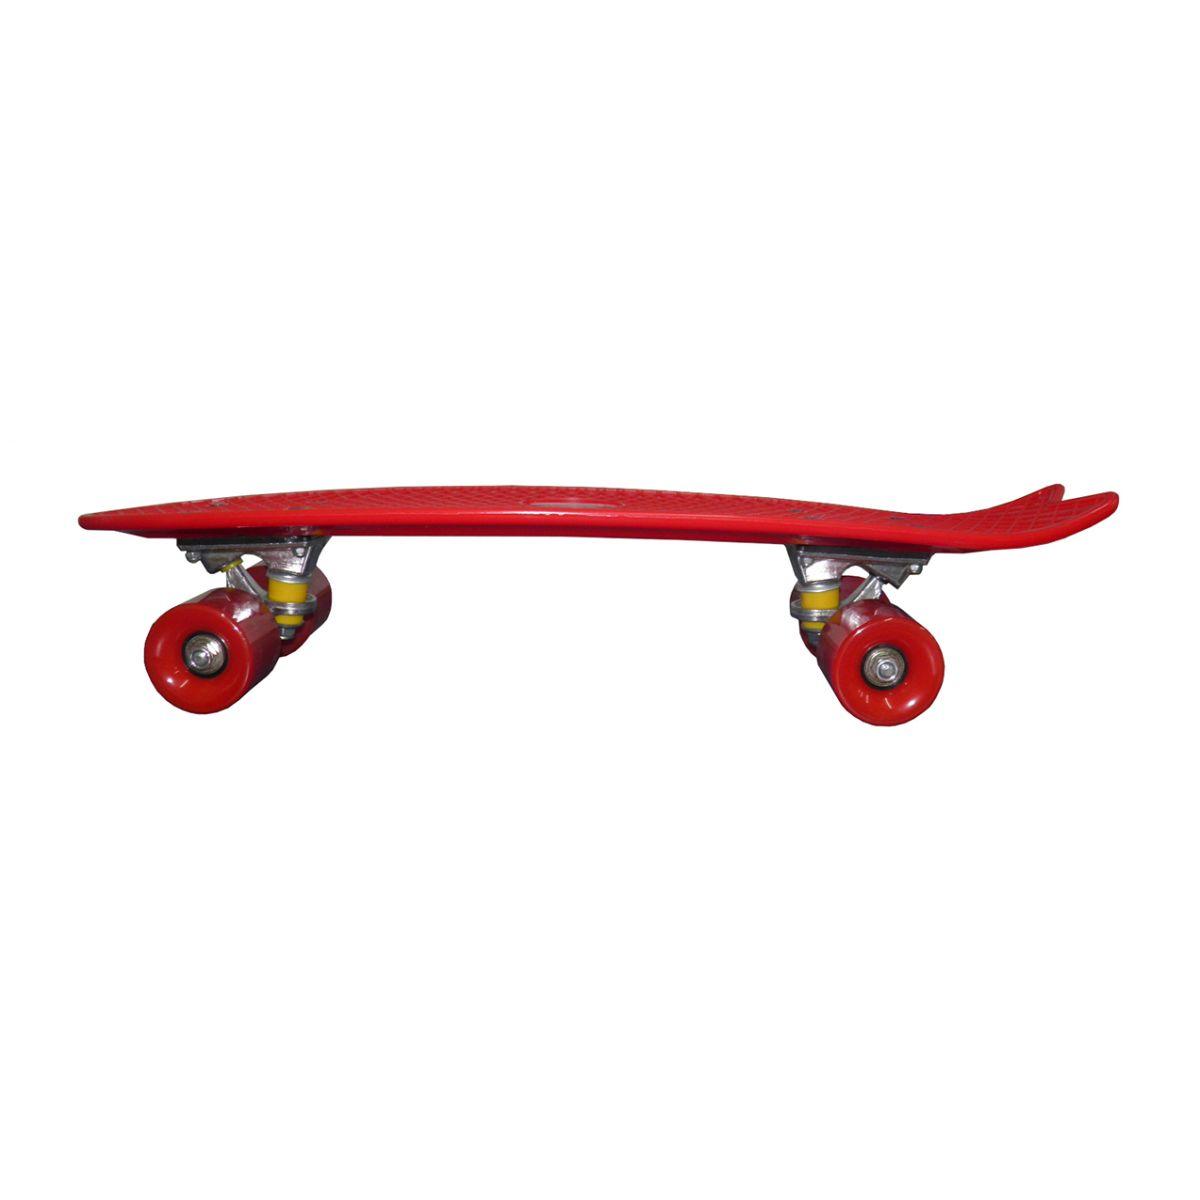 Skate Mini Longboard Retro Abec 7 Truck de Ferro Vermelho (SKT-12)